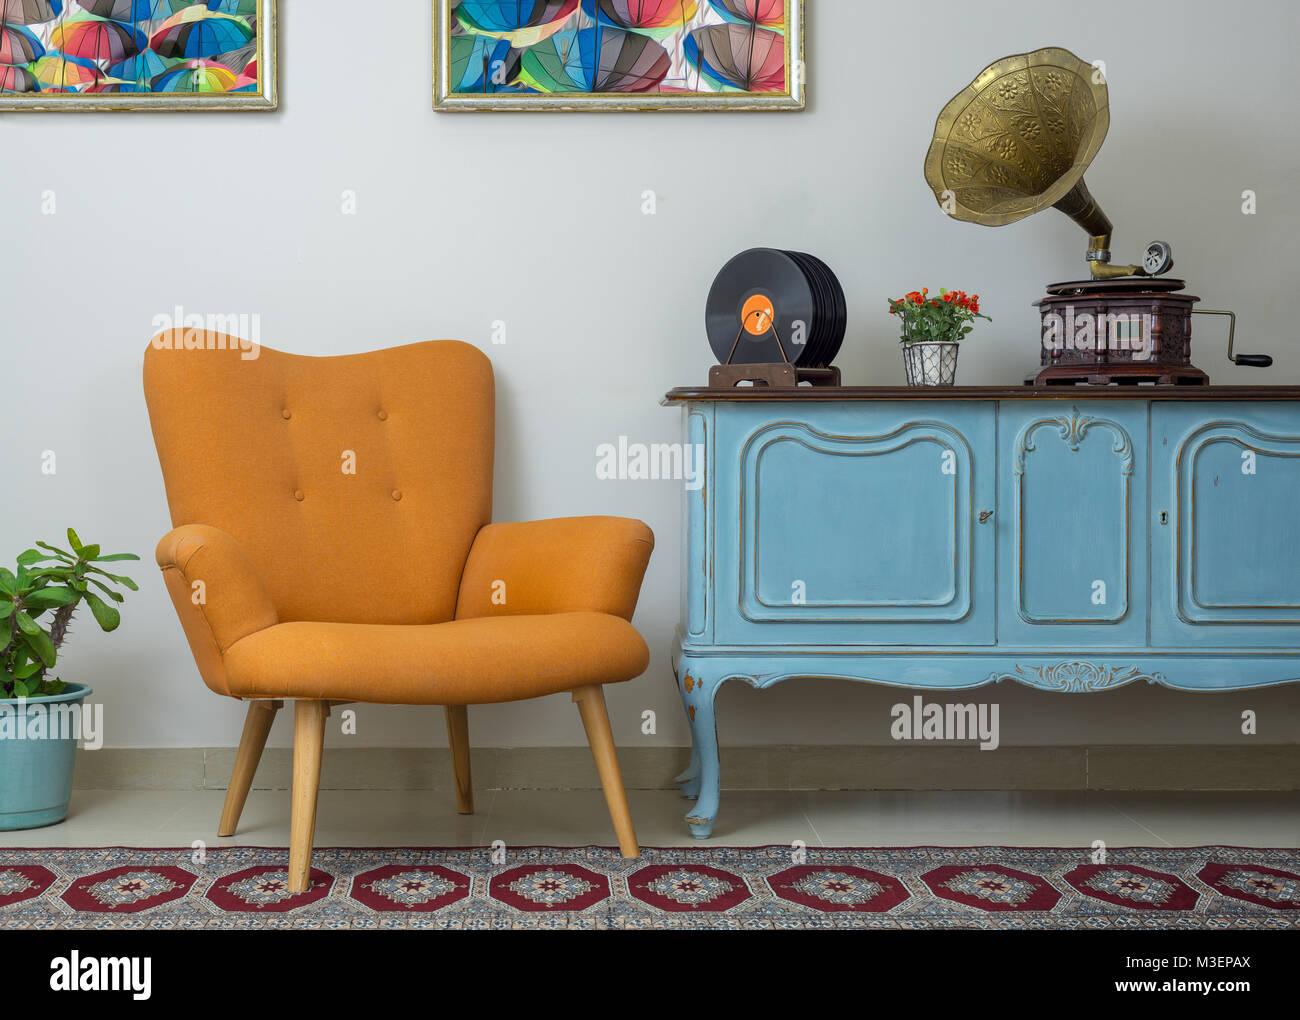 Vintage interior of retro orange armchair, vintage wooden light blue sideboard, old phonograph (gramophone), vinyl - Stock Image